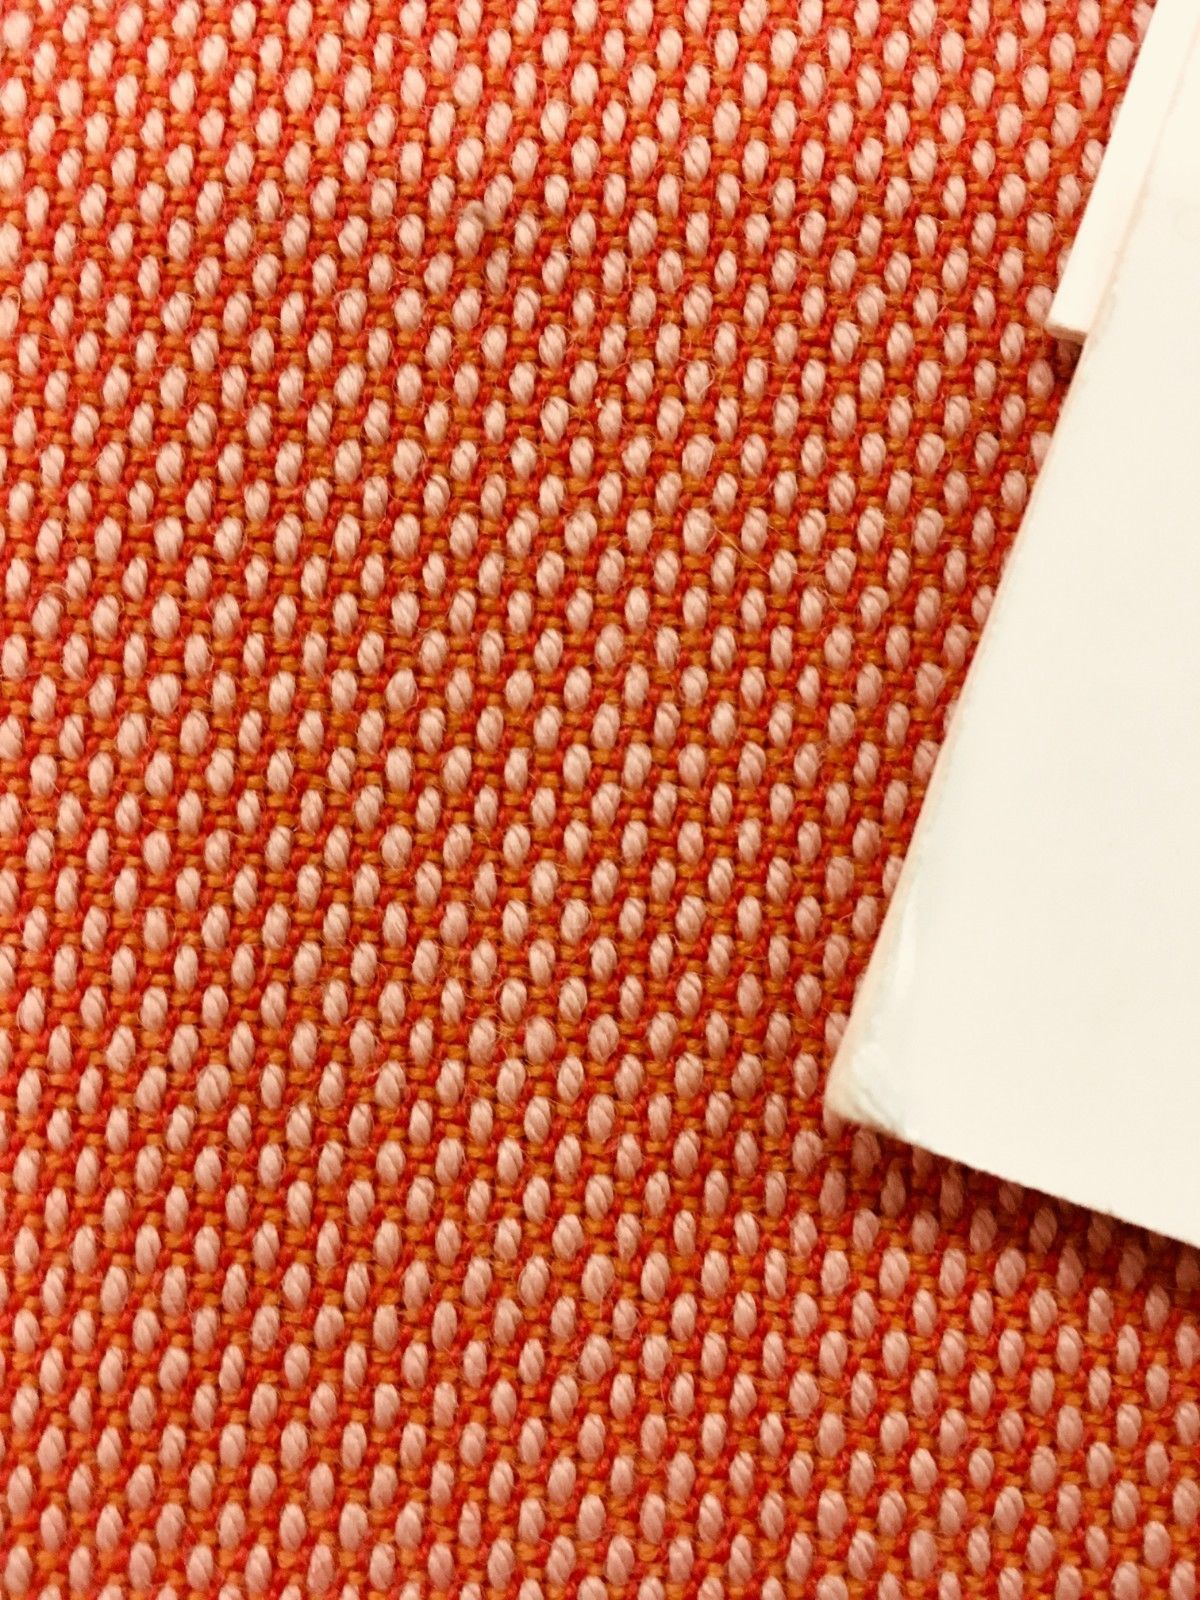 Maharam Upholstery Fabric Steelcut Trio Peach Wool 1.625 yds 465906 PH